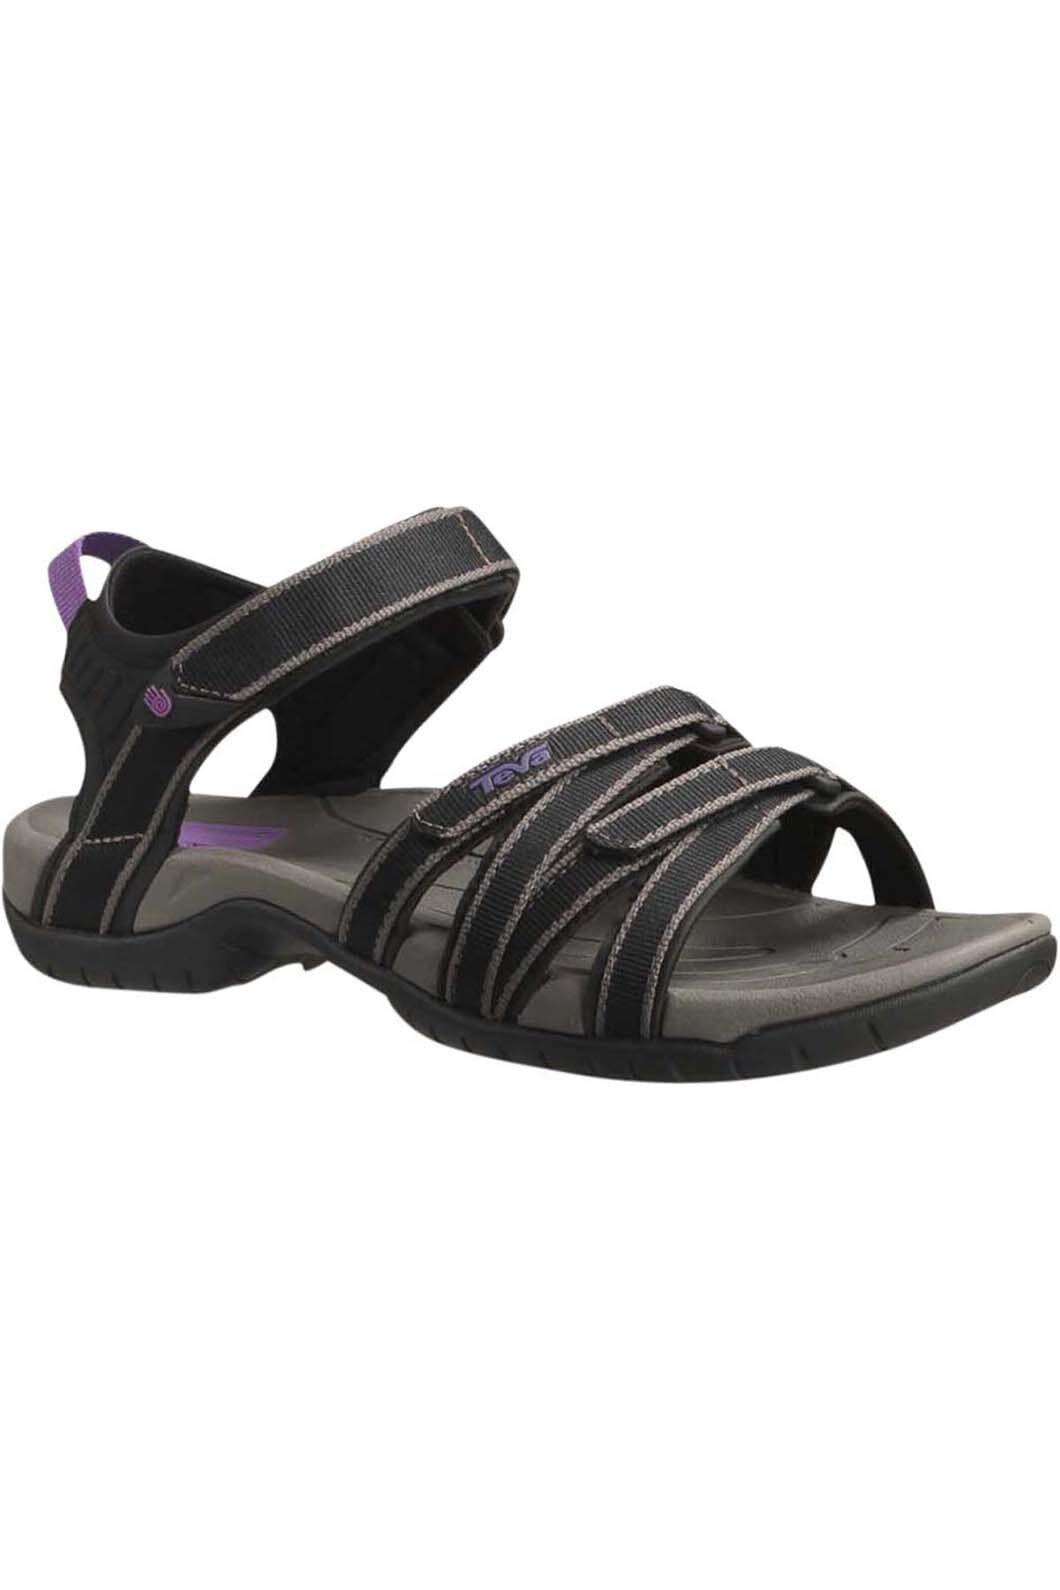 Teva Women's Tirra Sandal, Black/Grey, hi-res